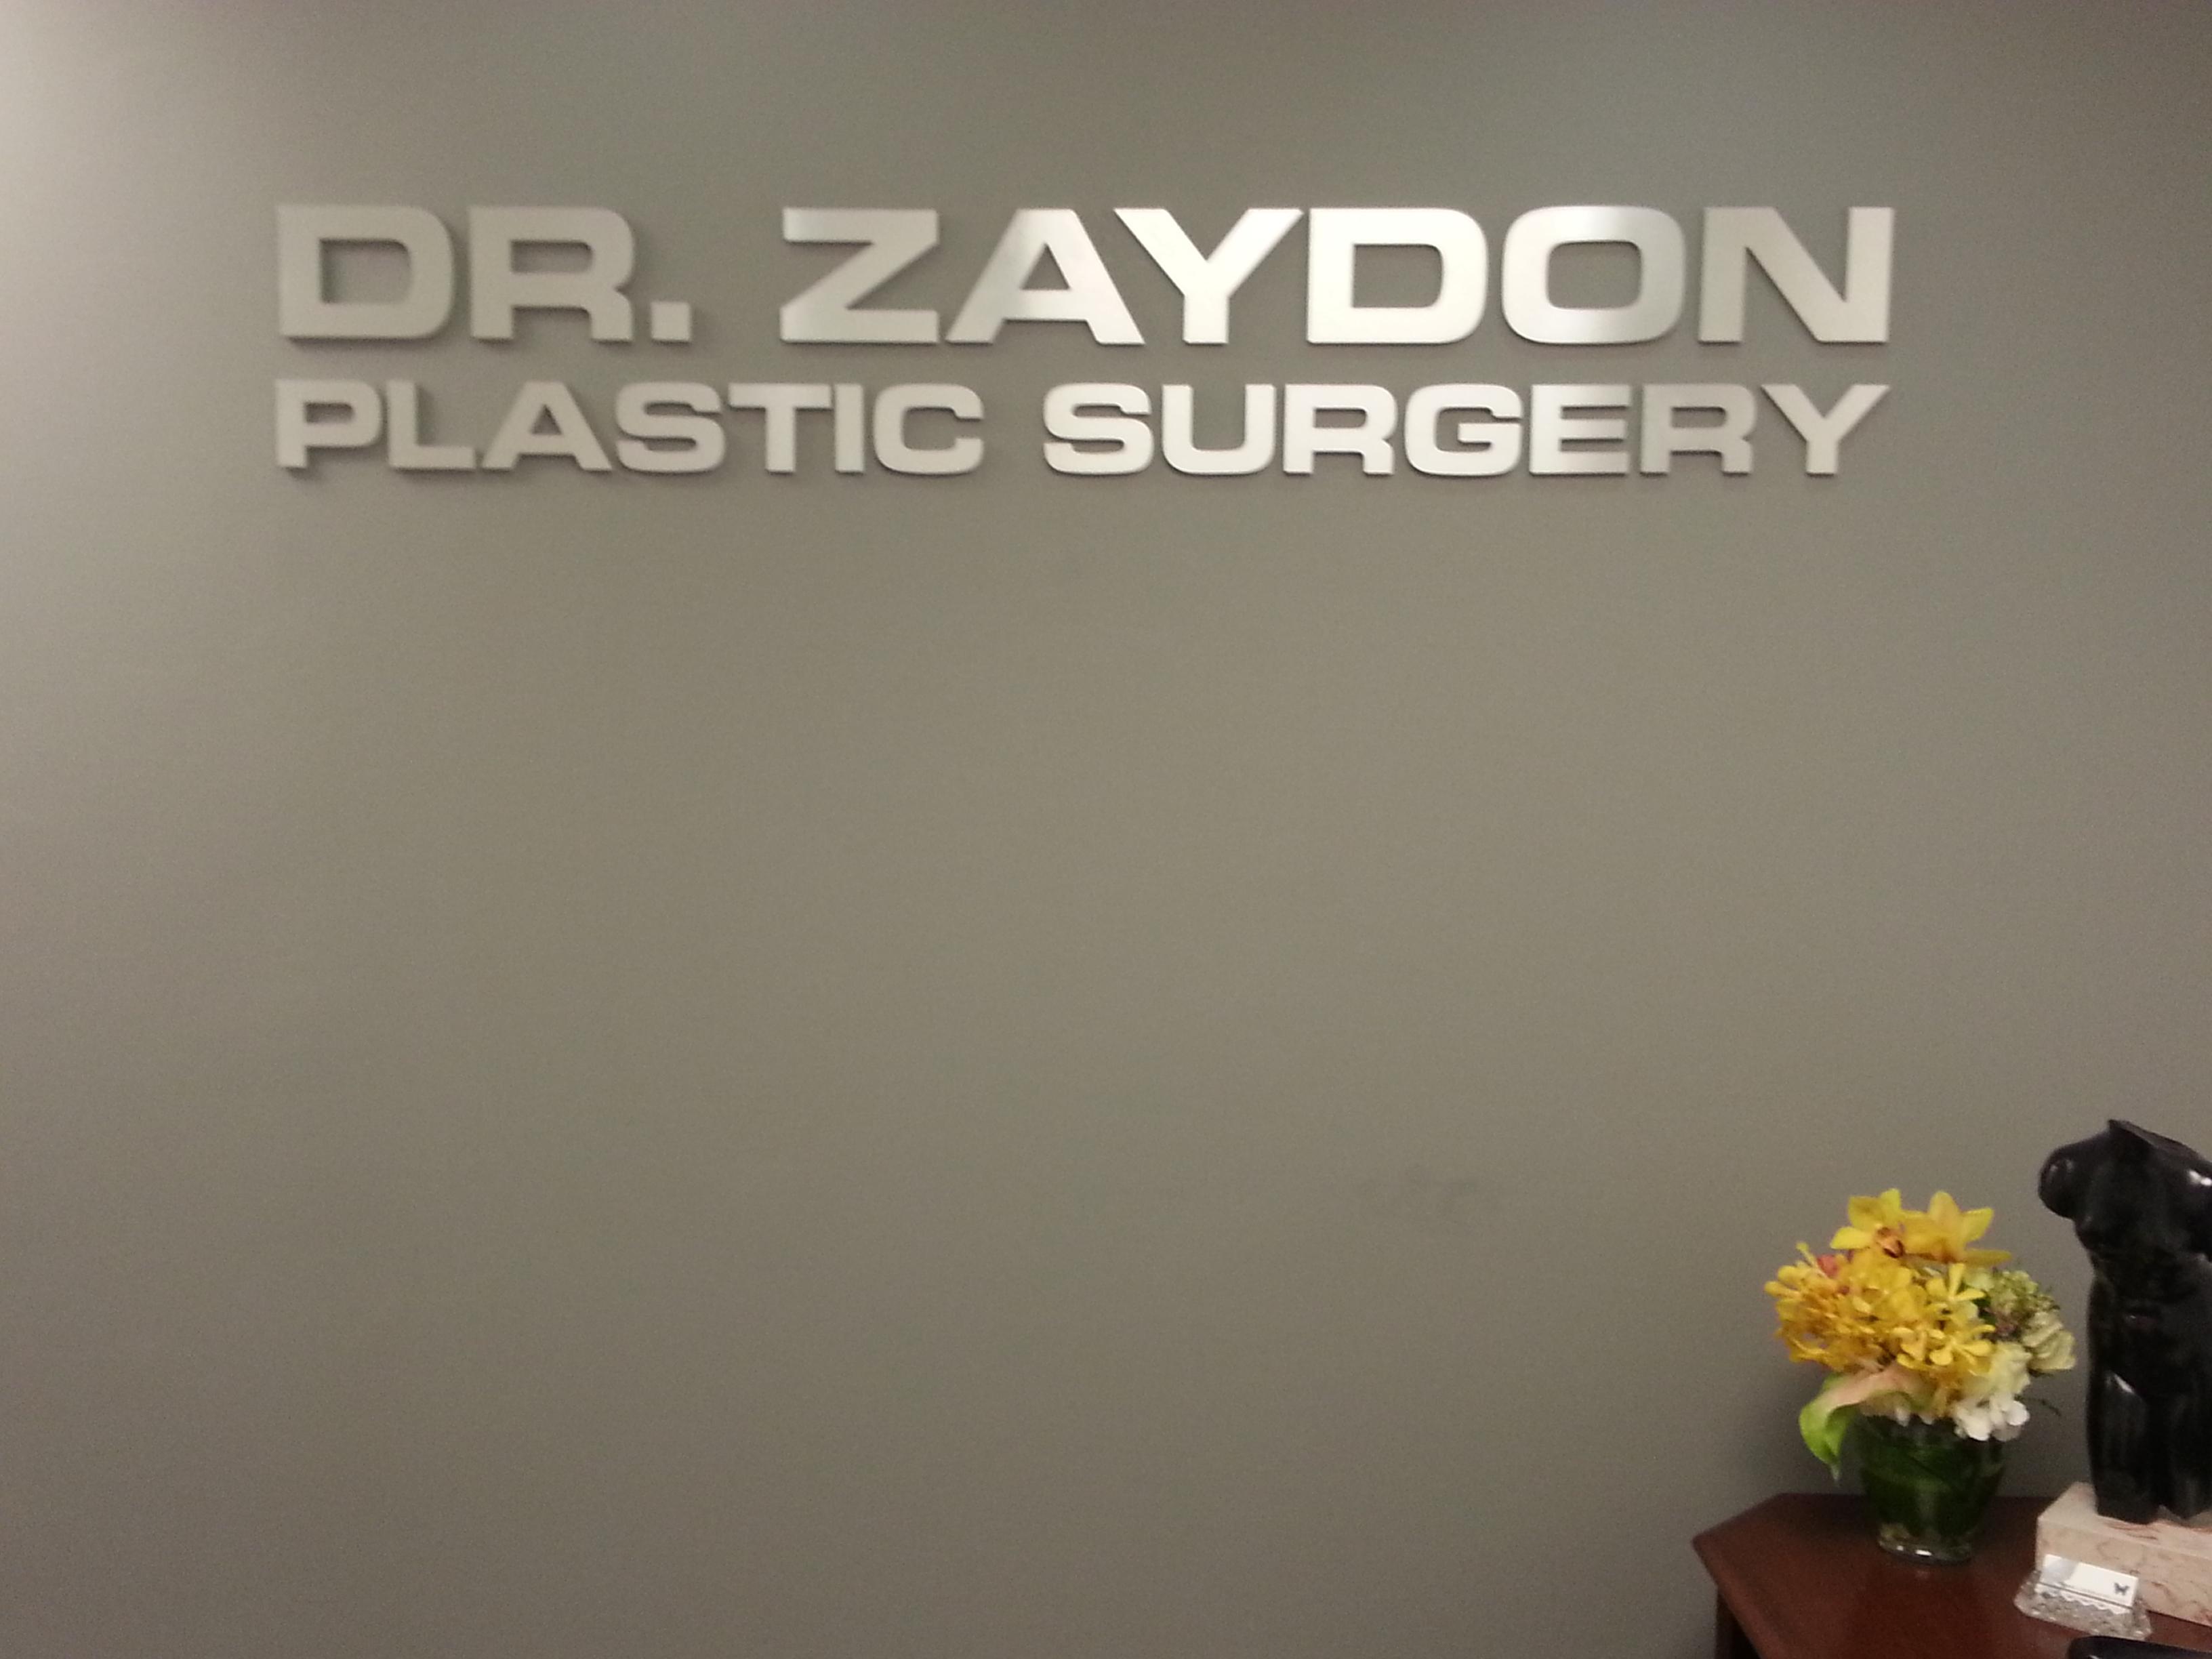 dr zaydon plastic surgery